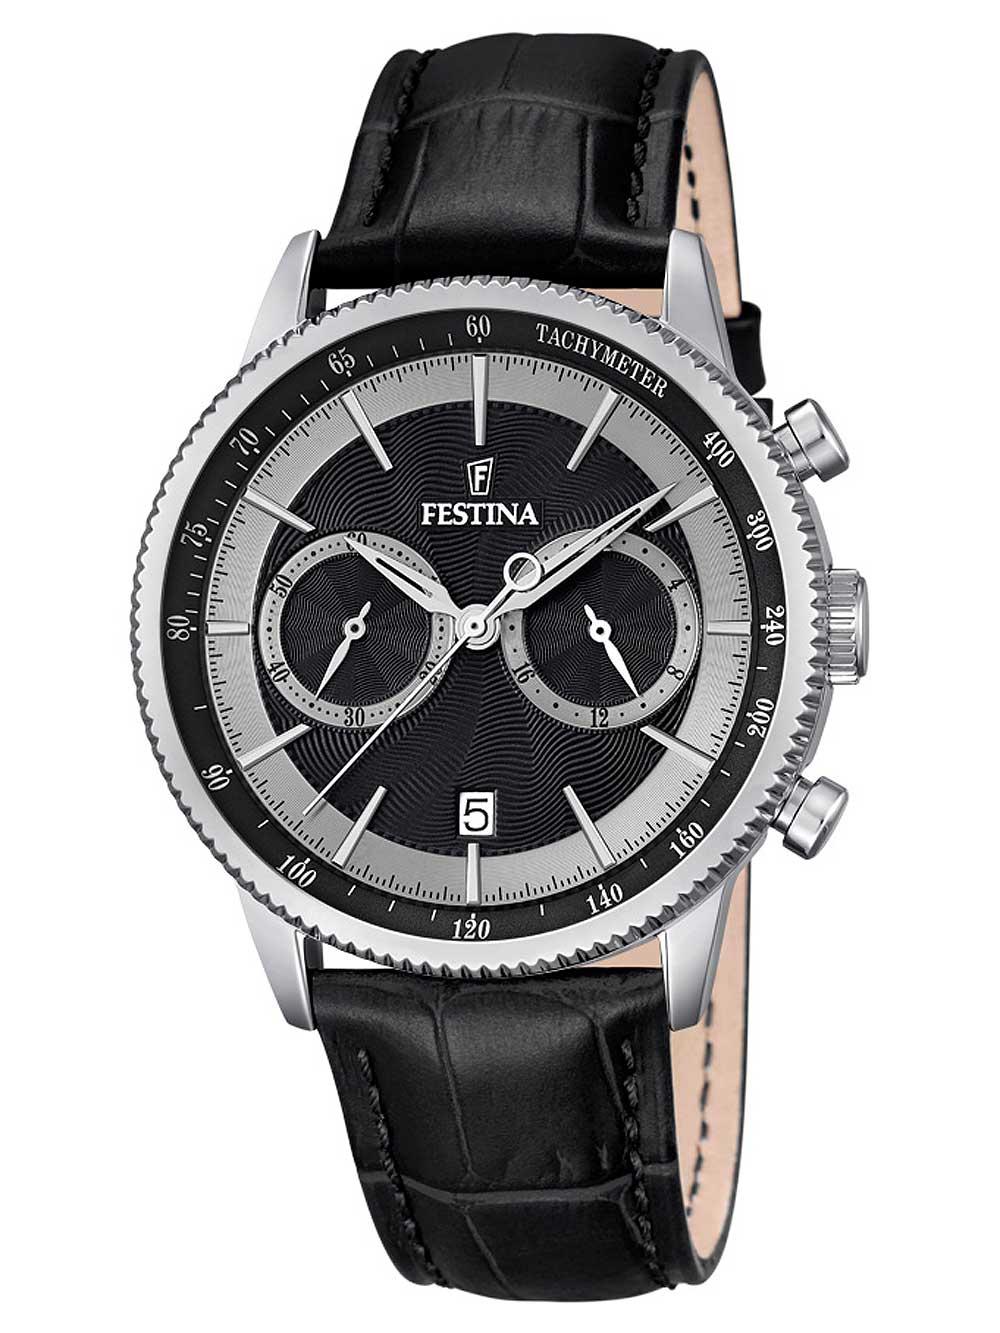 Festina F16893 8 Chronograph Herren 41mm 5ATM